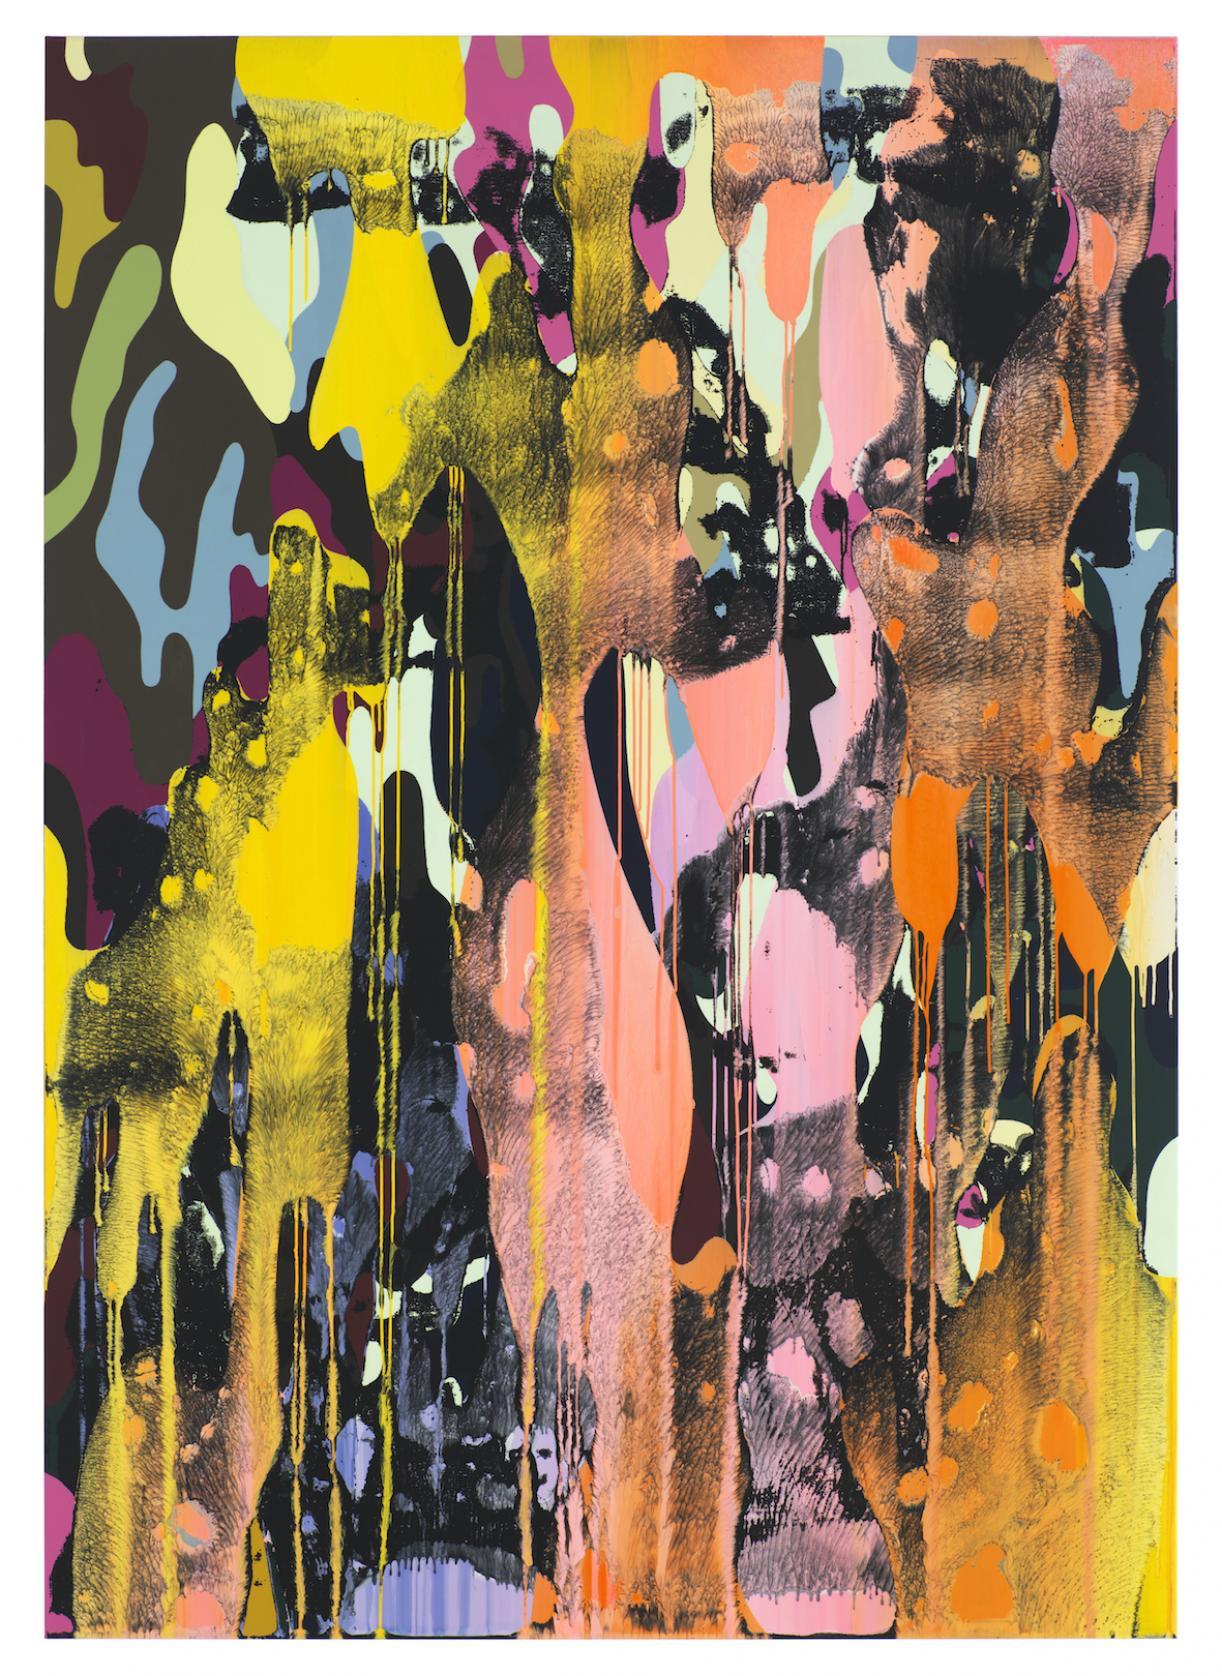 Christine Streuli, Warainting_004, 2016/17, Mixed media on canvas, 243,5 x 173 cm